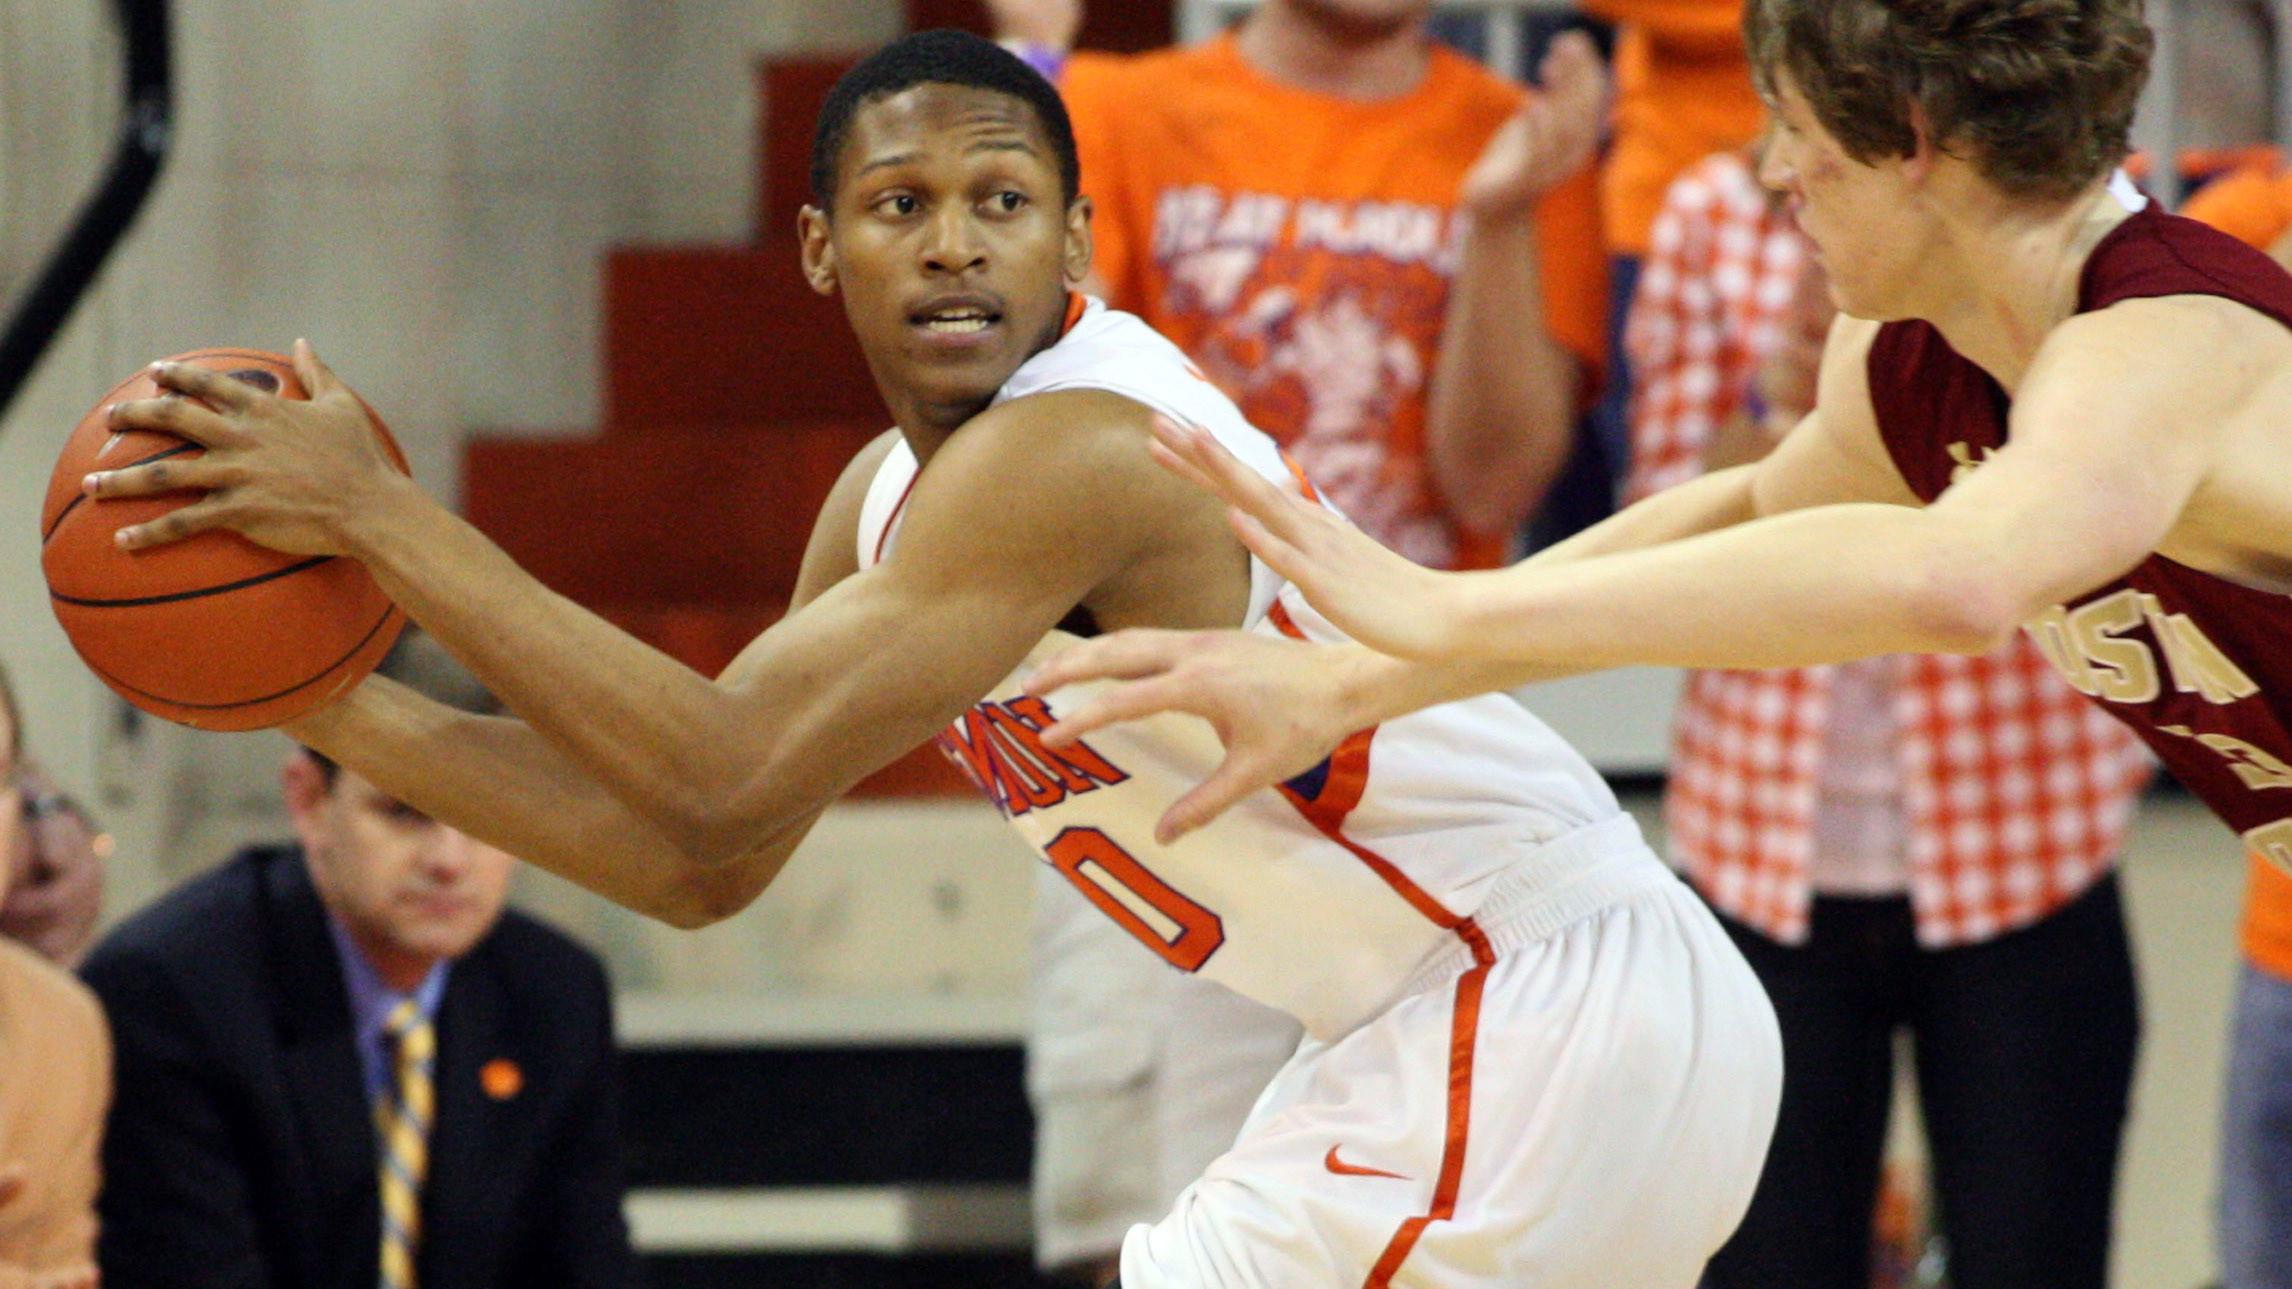 Roper Named to All-ACC Academic Men's Basketball Team